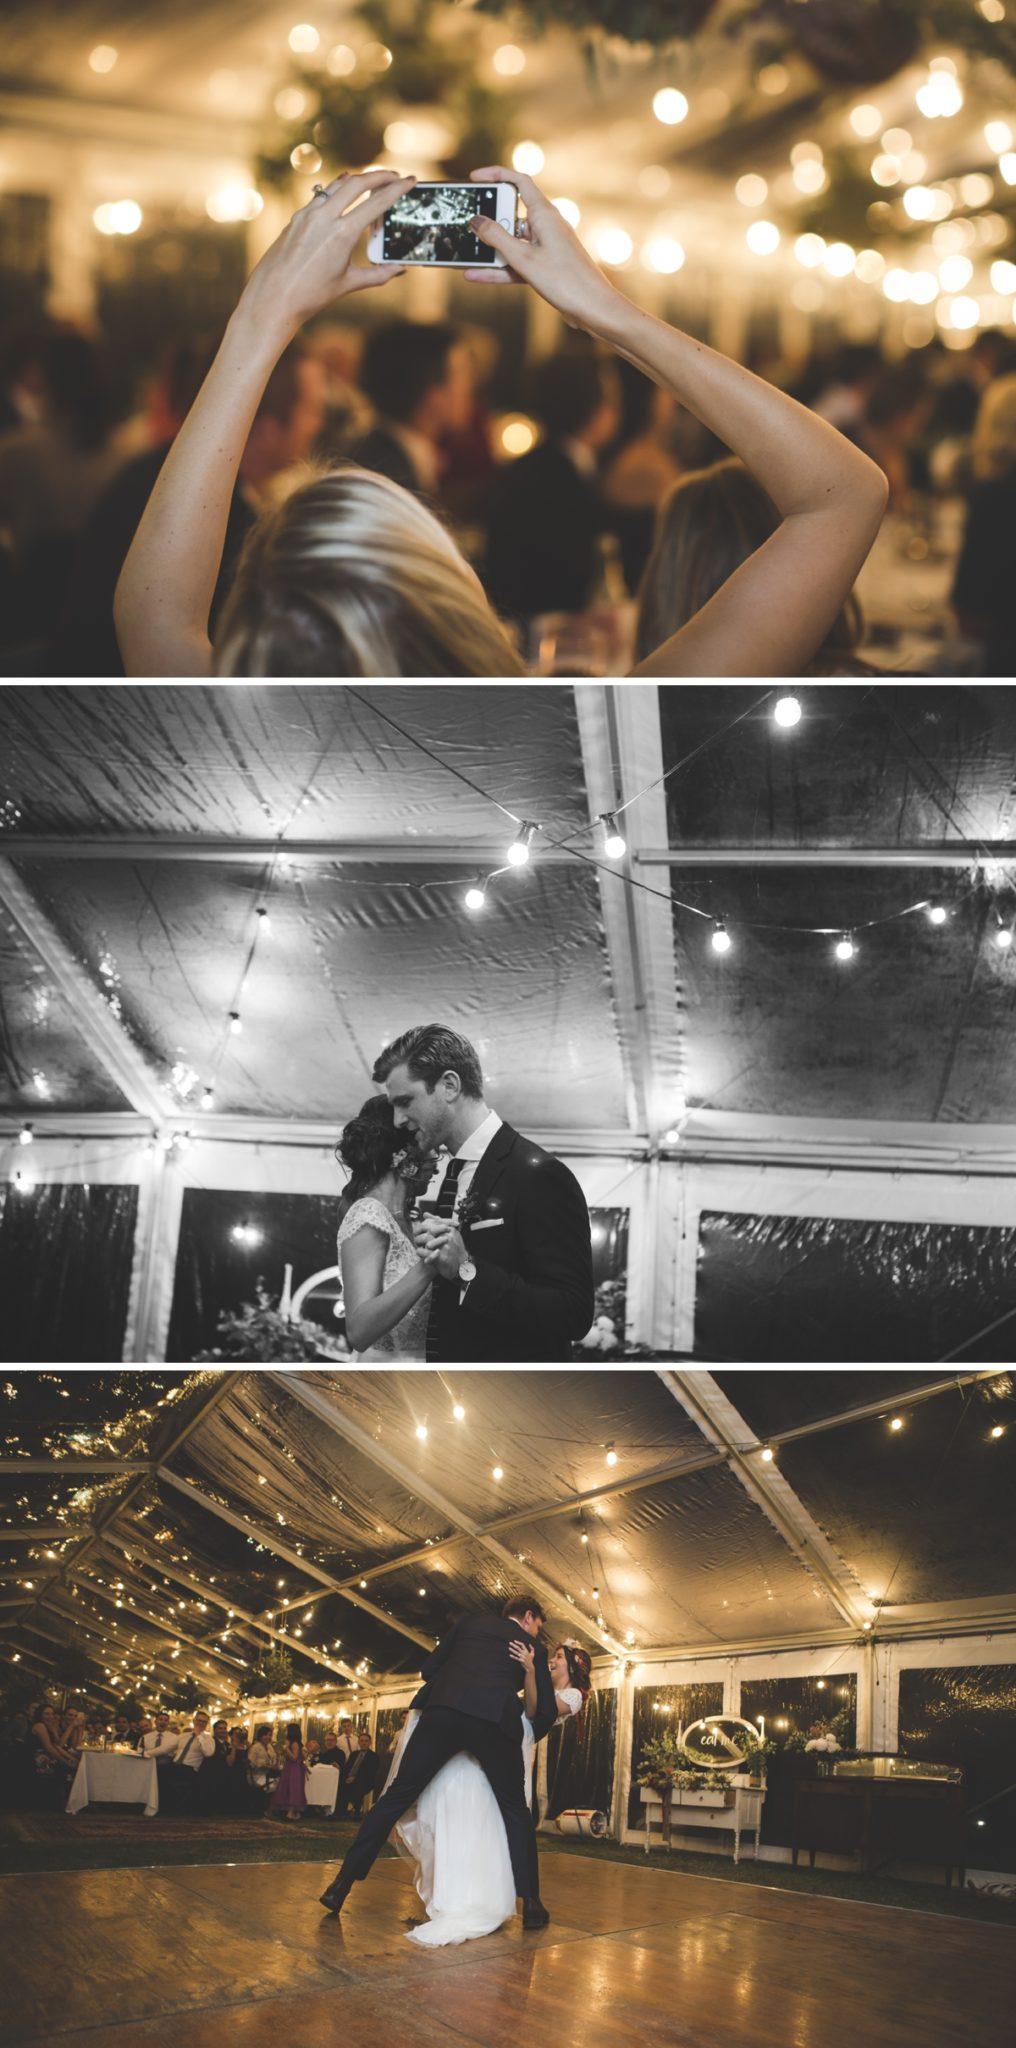 Wagga Wagga Wedding Photographer at Borambola Winery Wagga Wagga Albury wedding photographer Culcairn wedding venue_1081